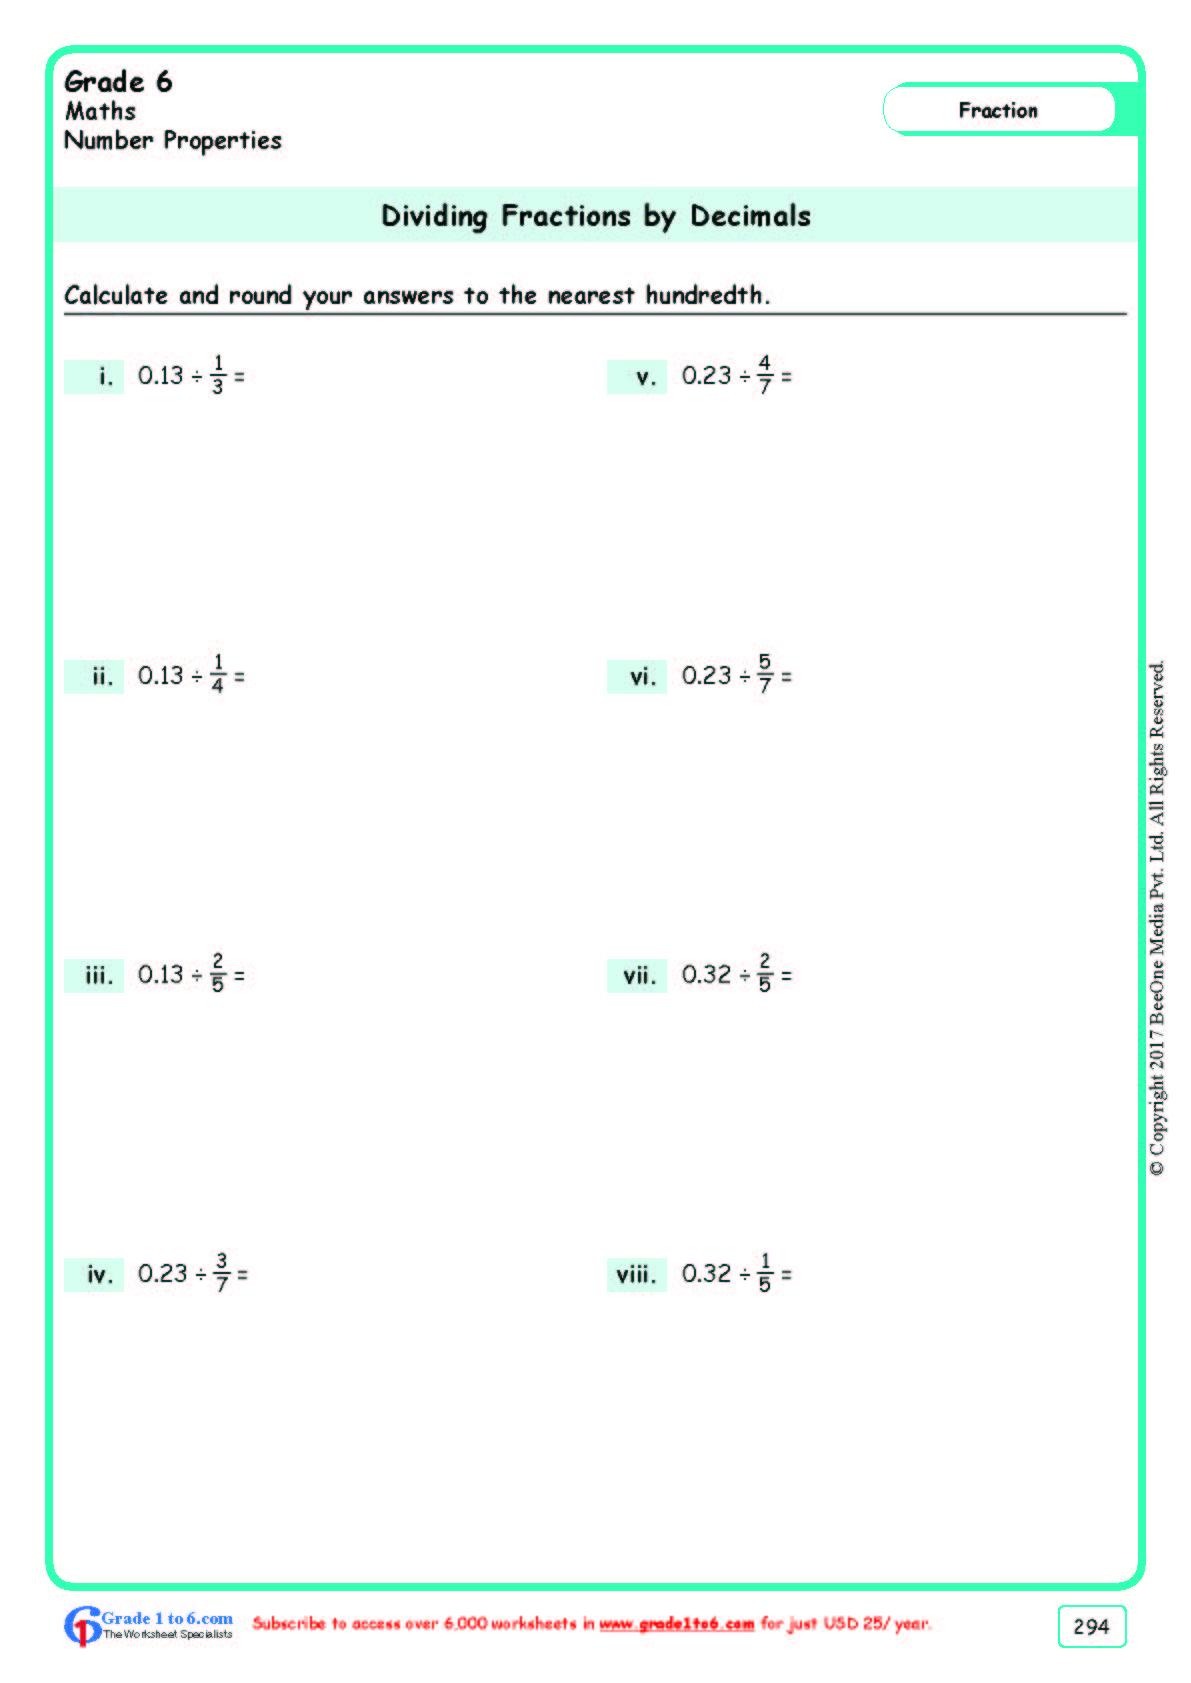 Grade 6 Class Six Dividing Fractions Worksheets